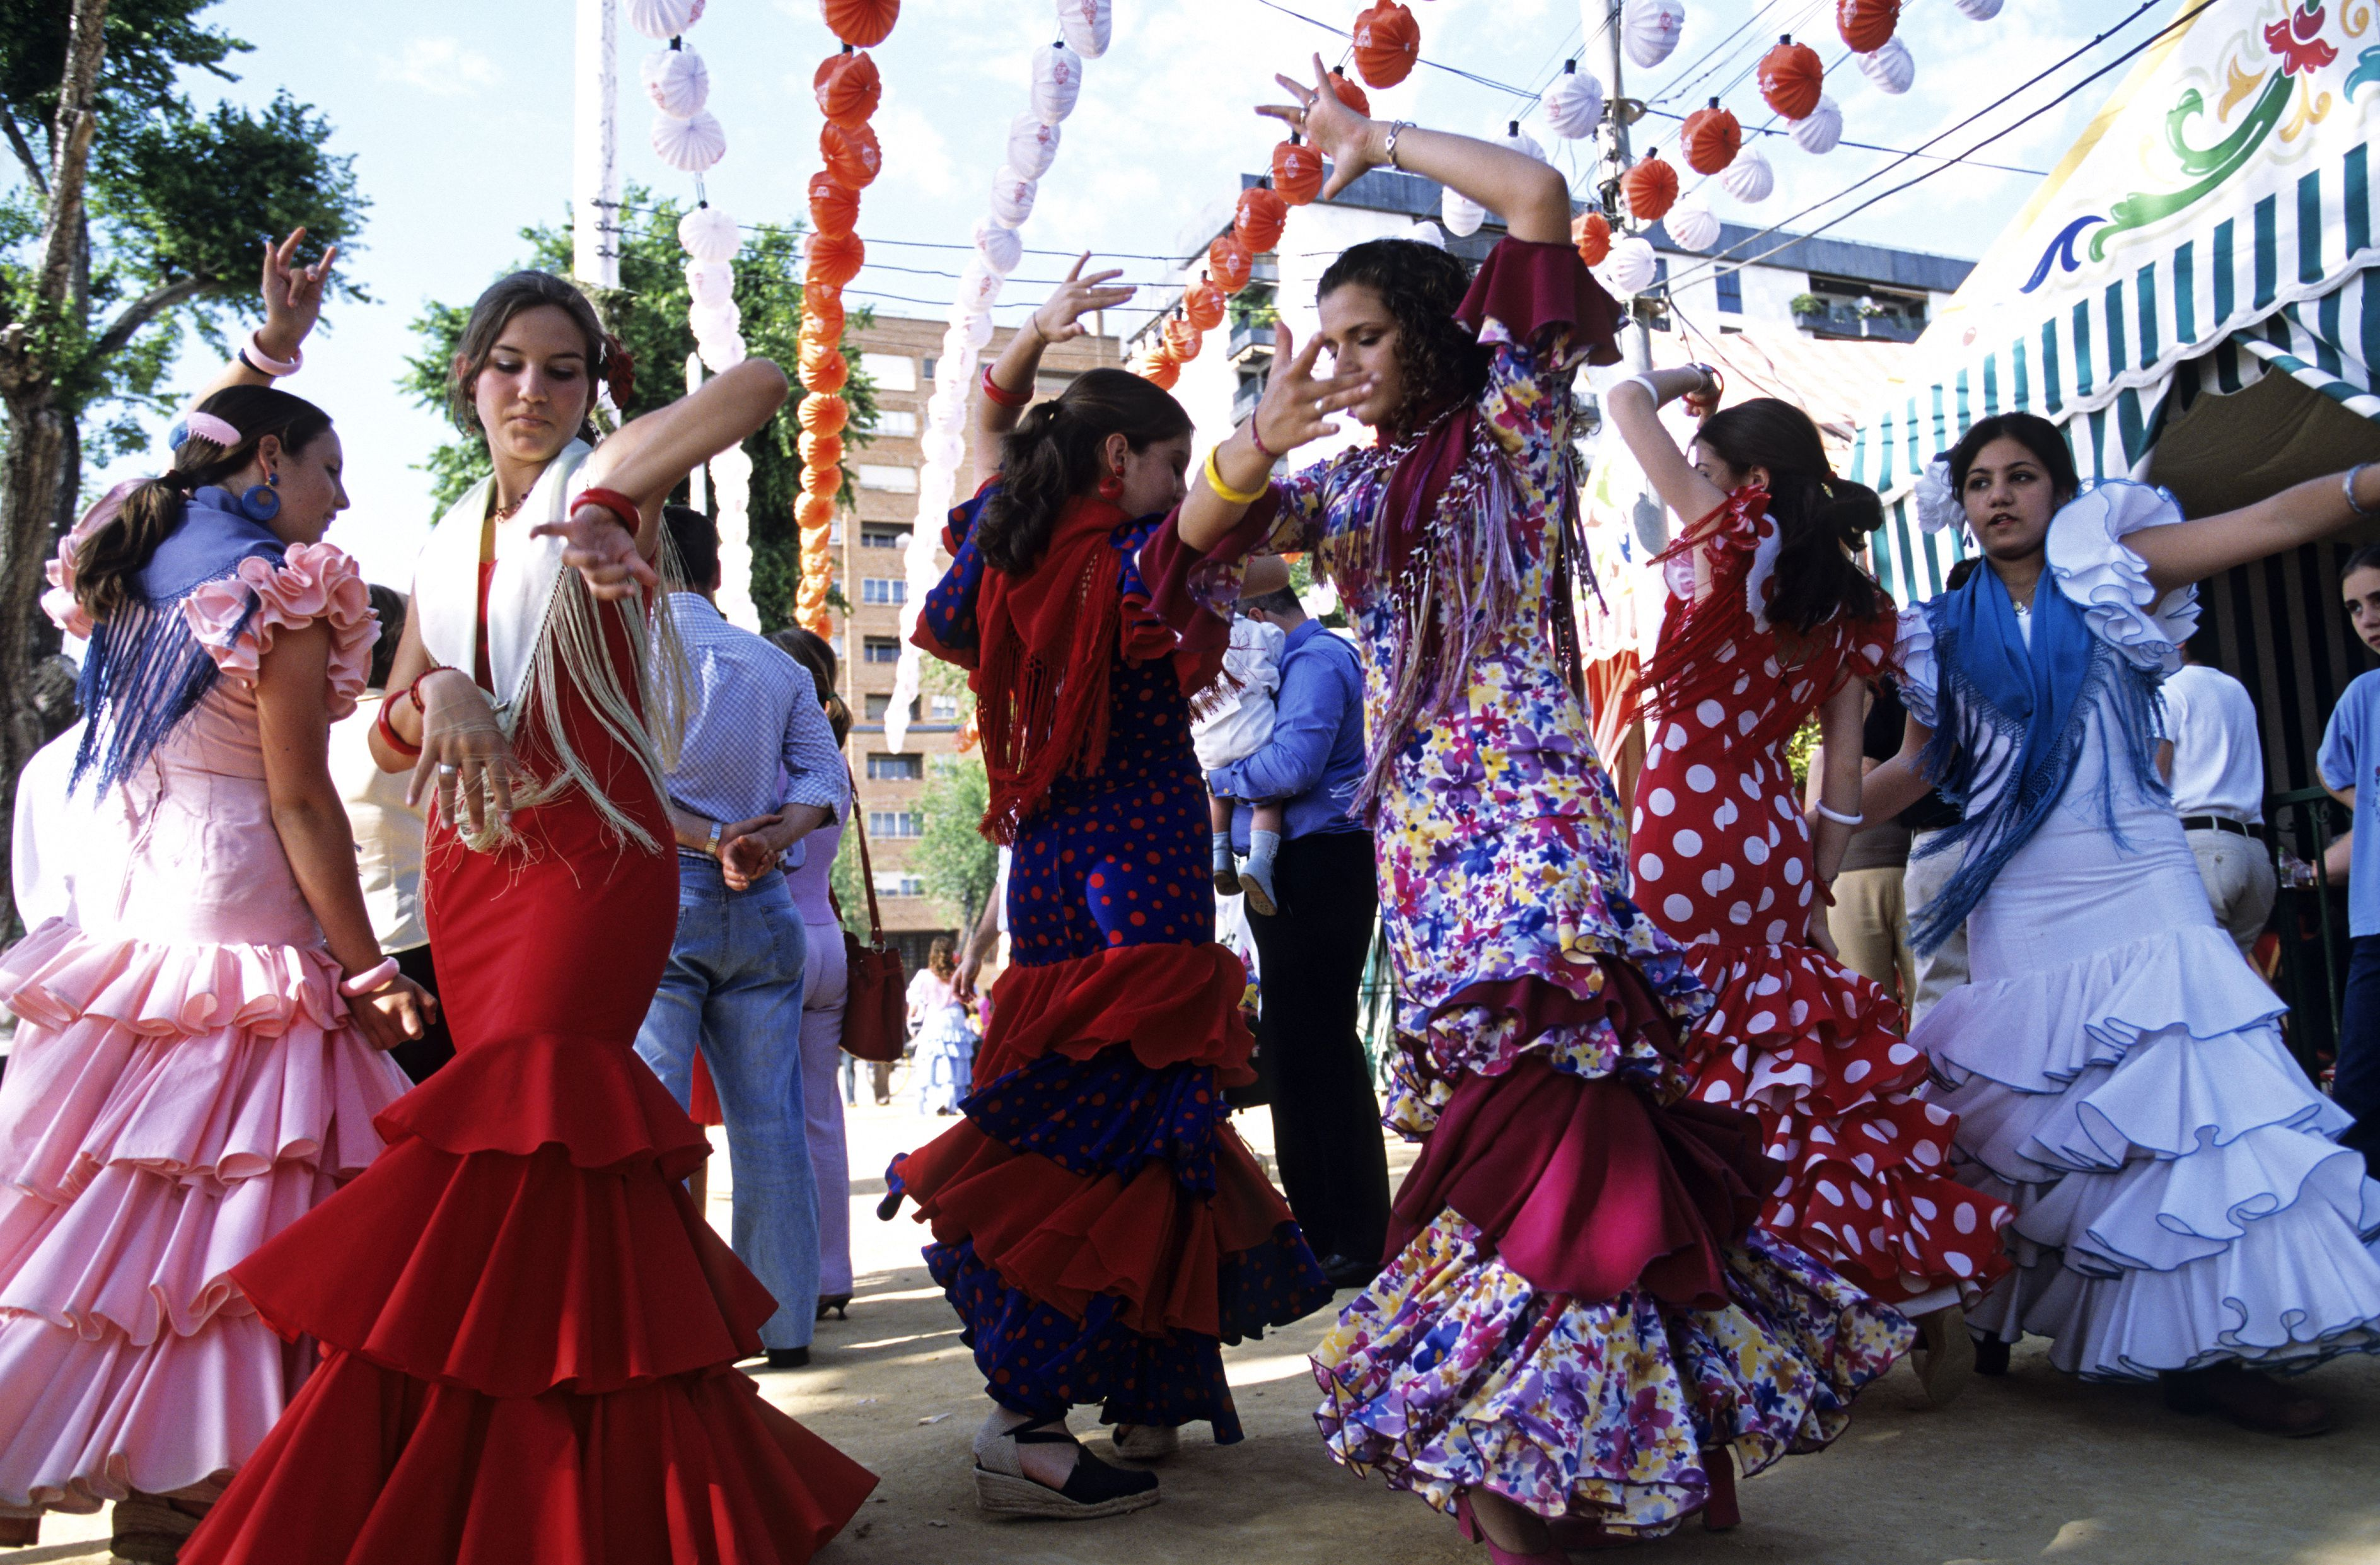 Flamenco fandango en Sevilla